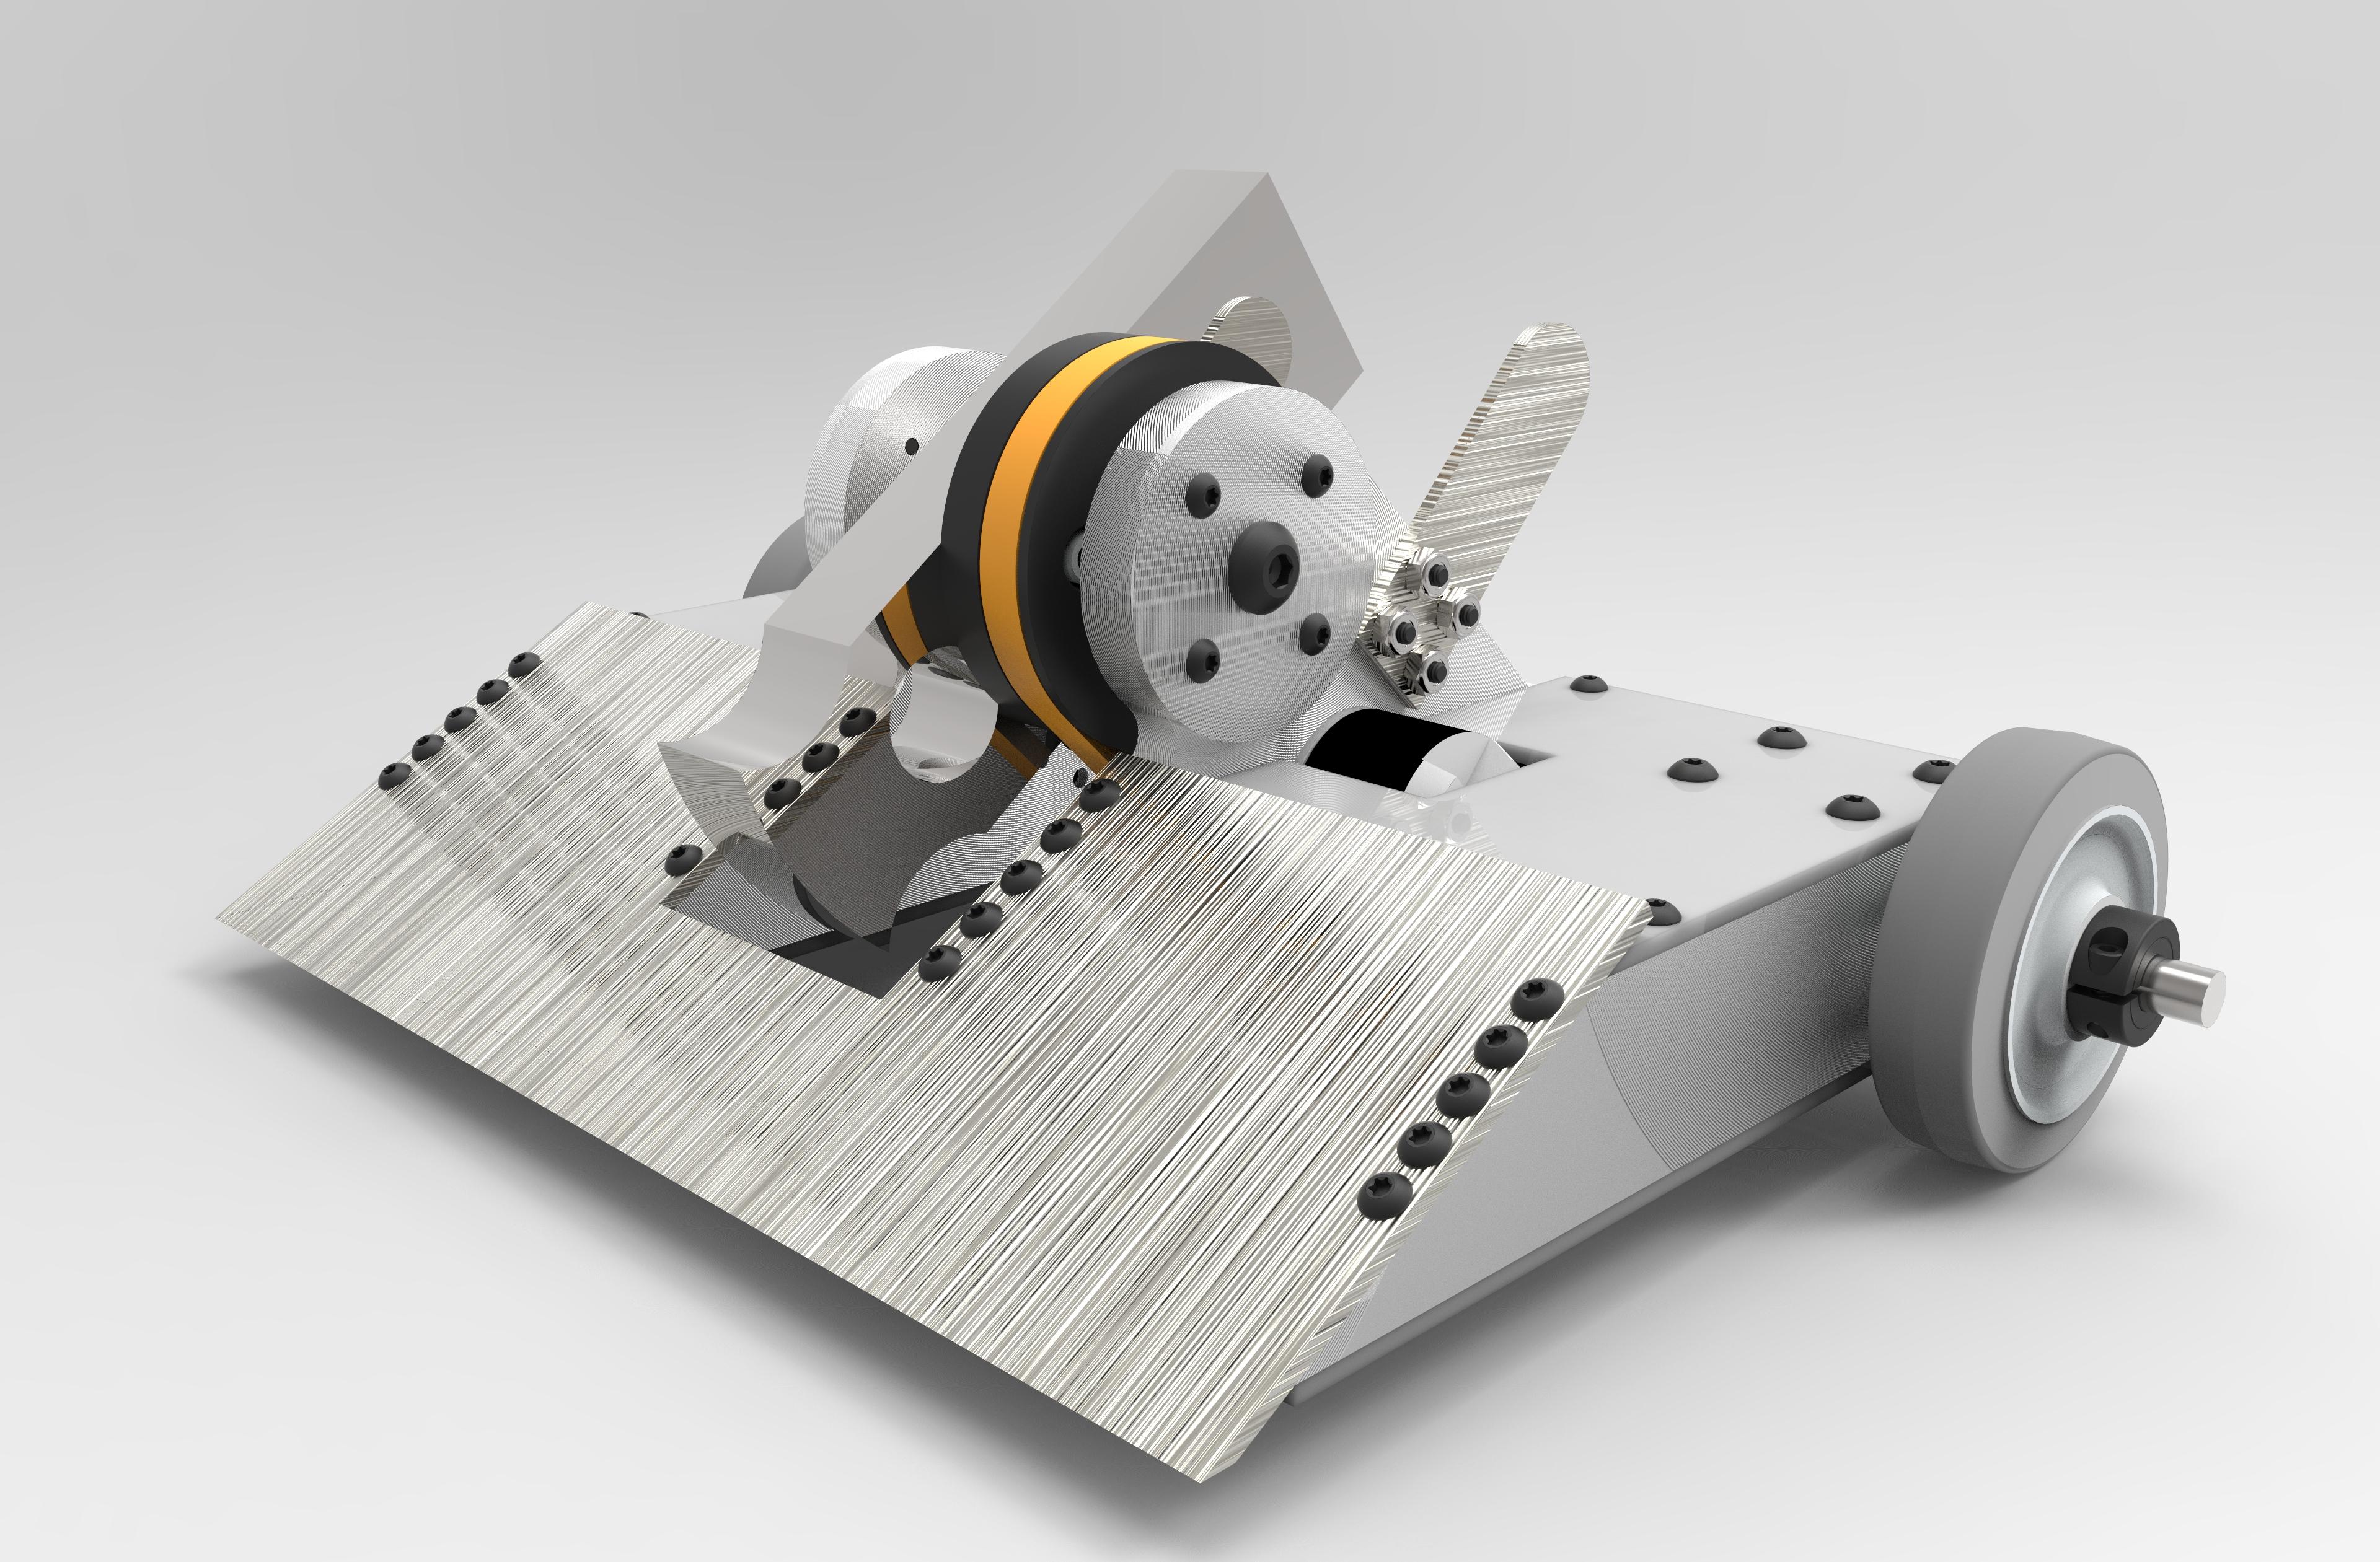 12LB UPPERCUT武术对战机器人车3D图纸 Solidworks设计 STEP IGS